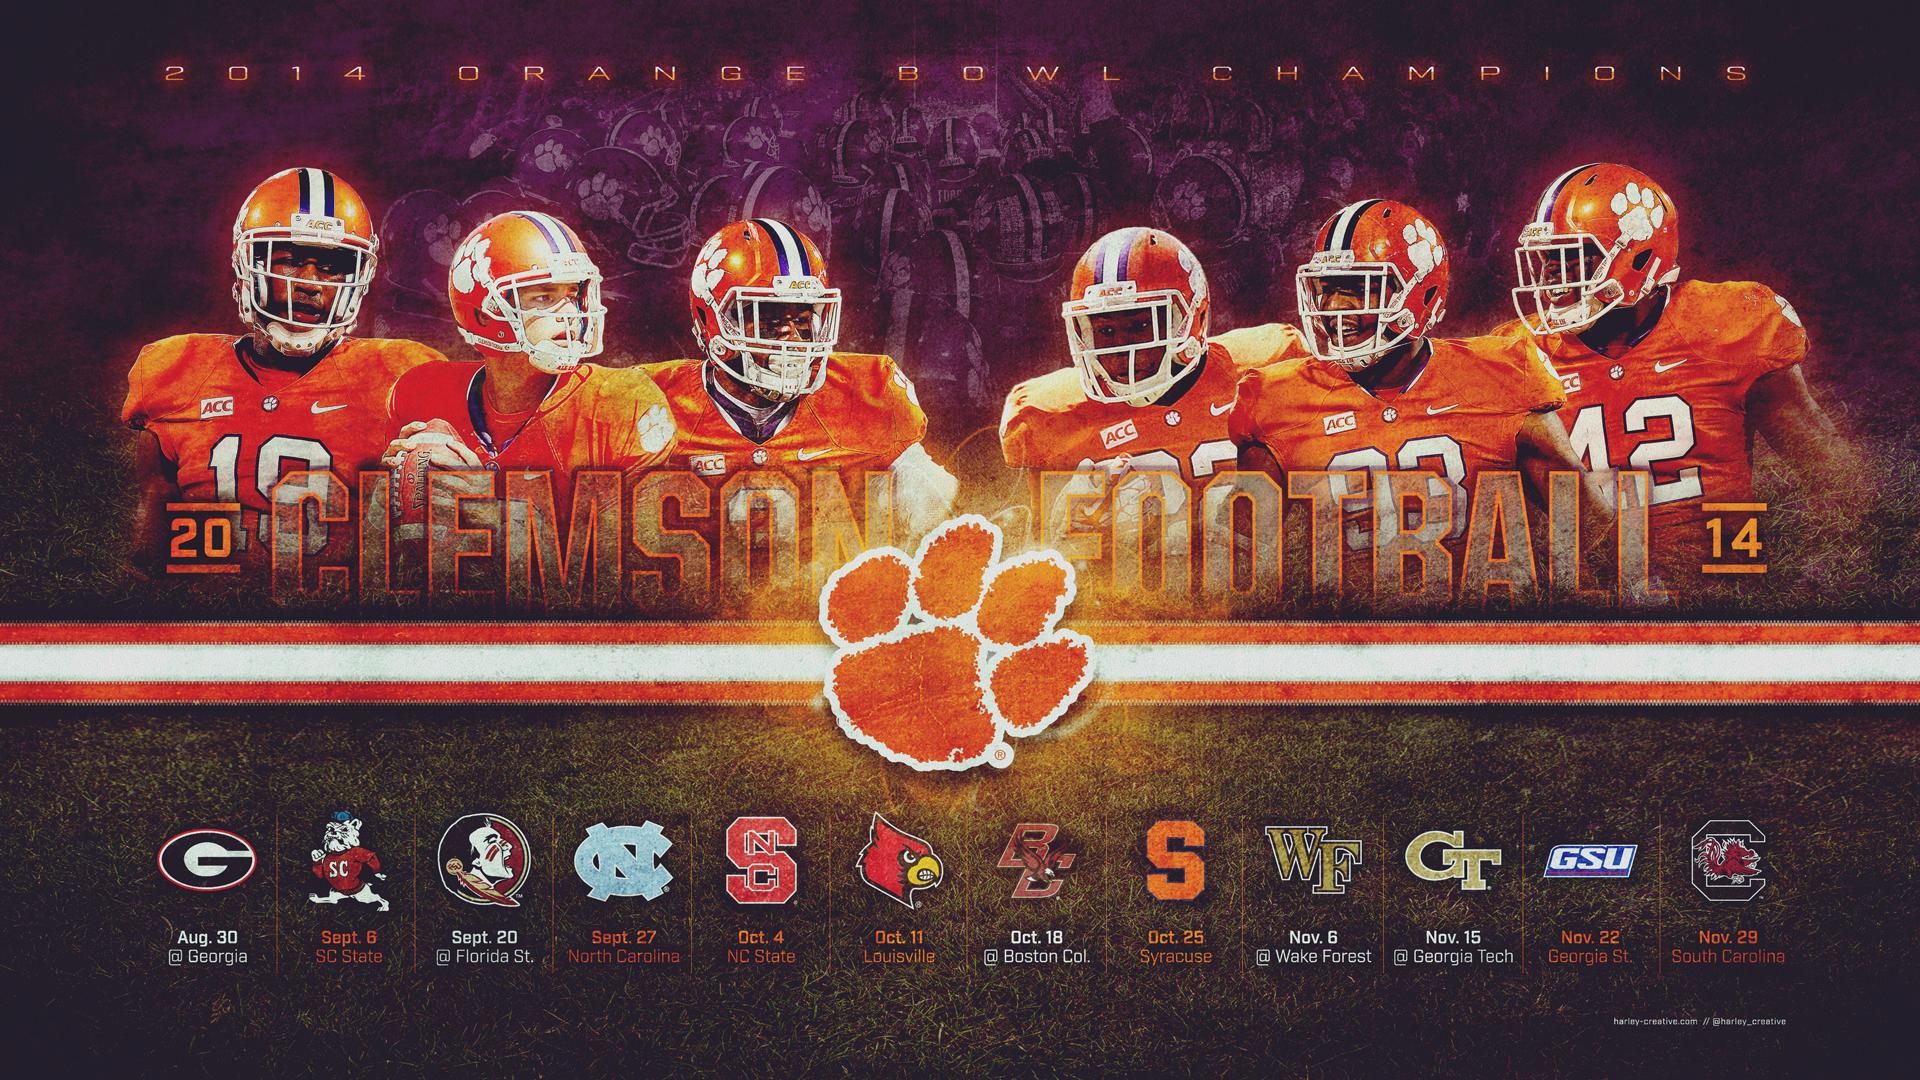 2014 Clemson Football Wallpaper Harley Creative 1920x1080